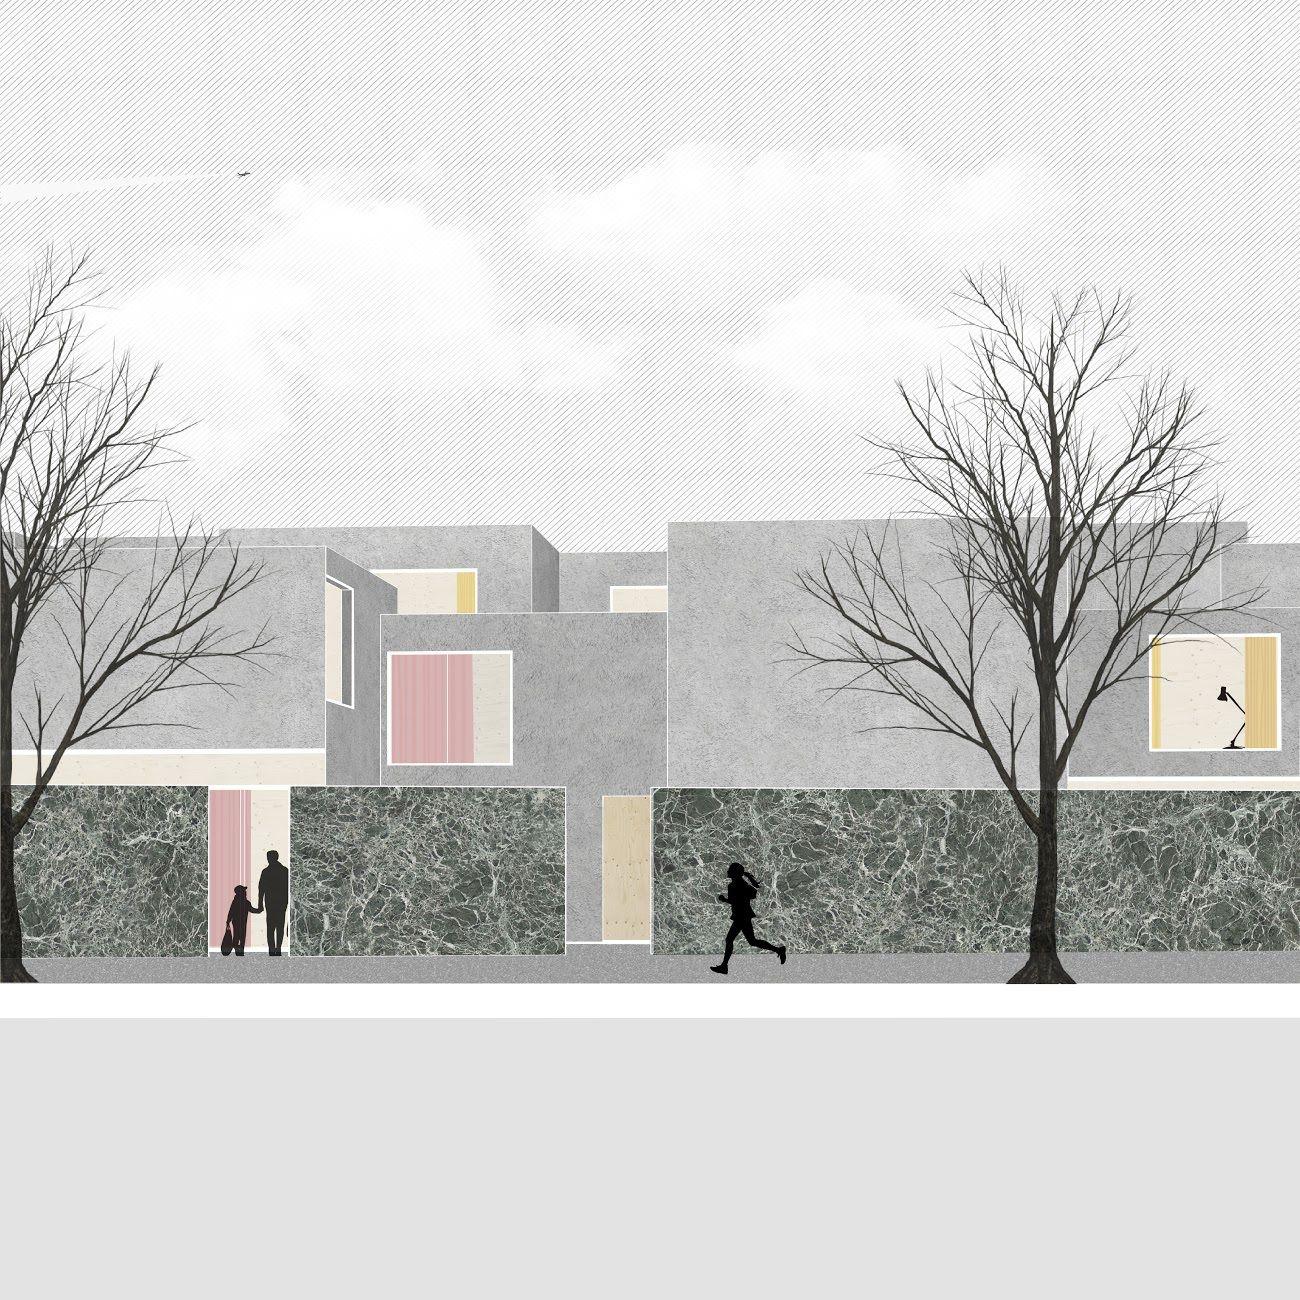 Anna budzinskaya pasadena housing perspective 1 cal poly pomona graf maf pinterest for Cal poly pomona interior design